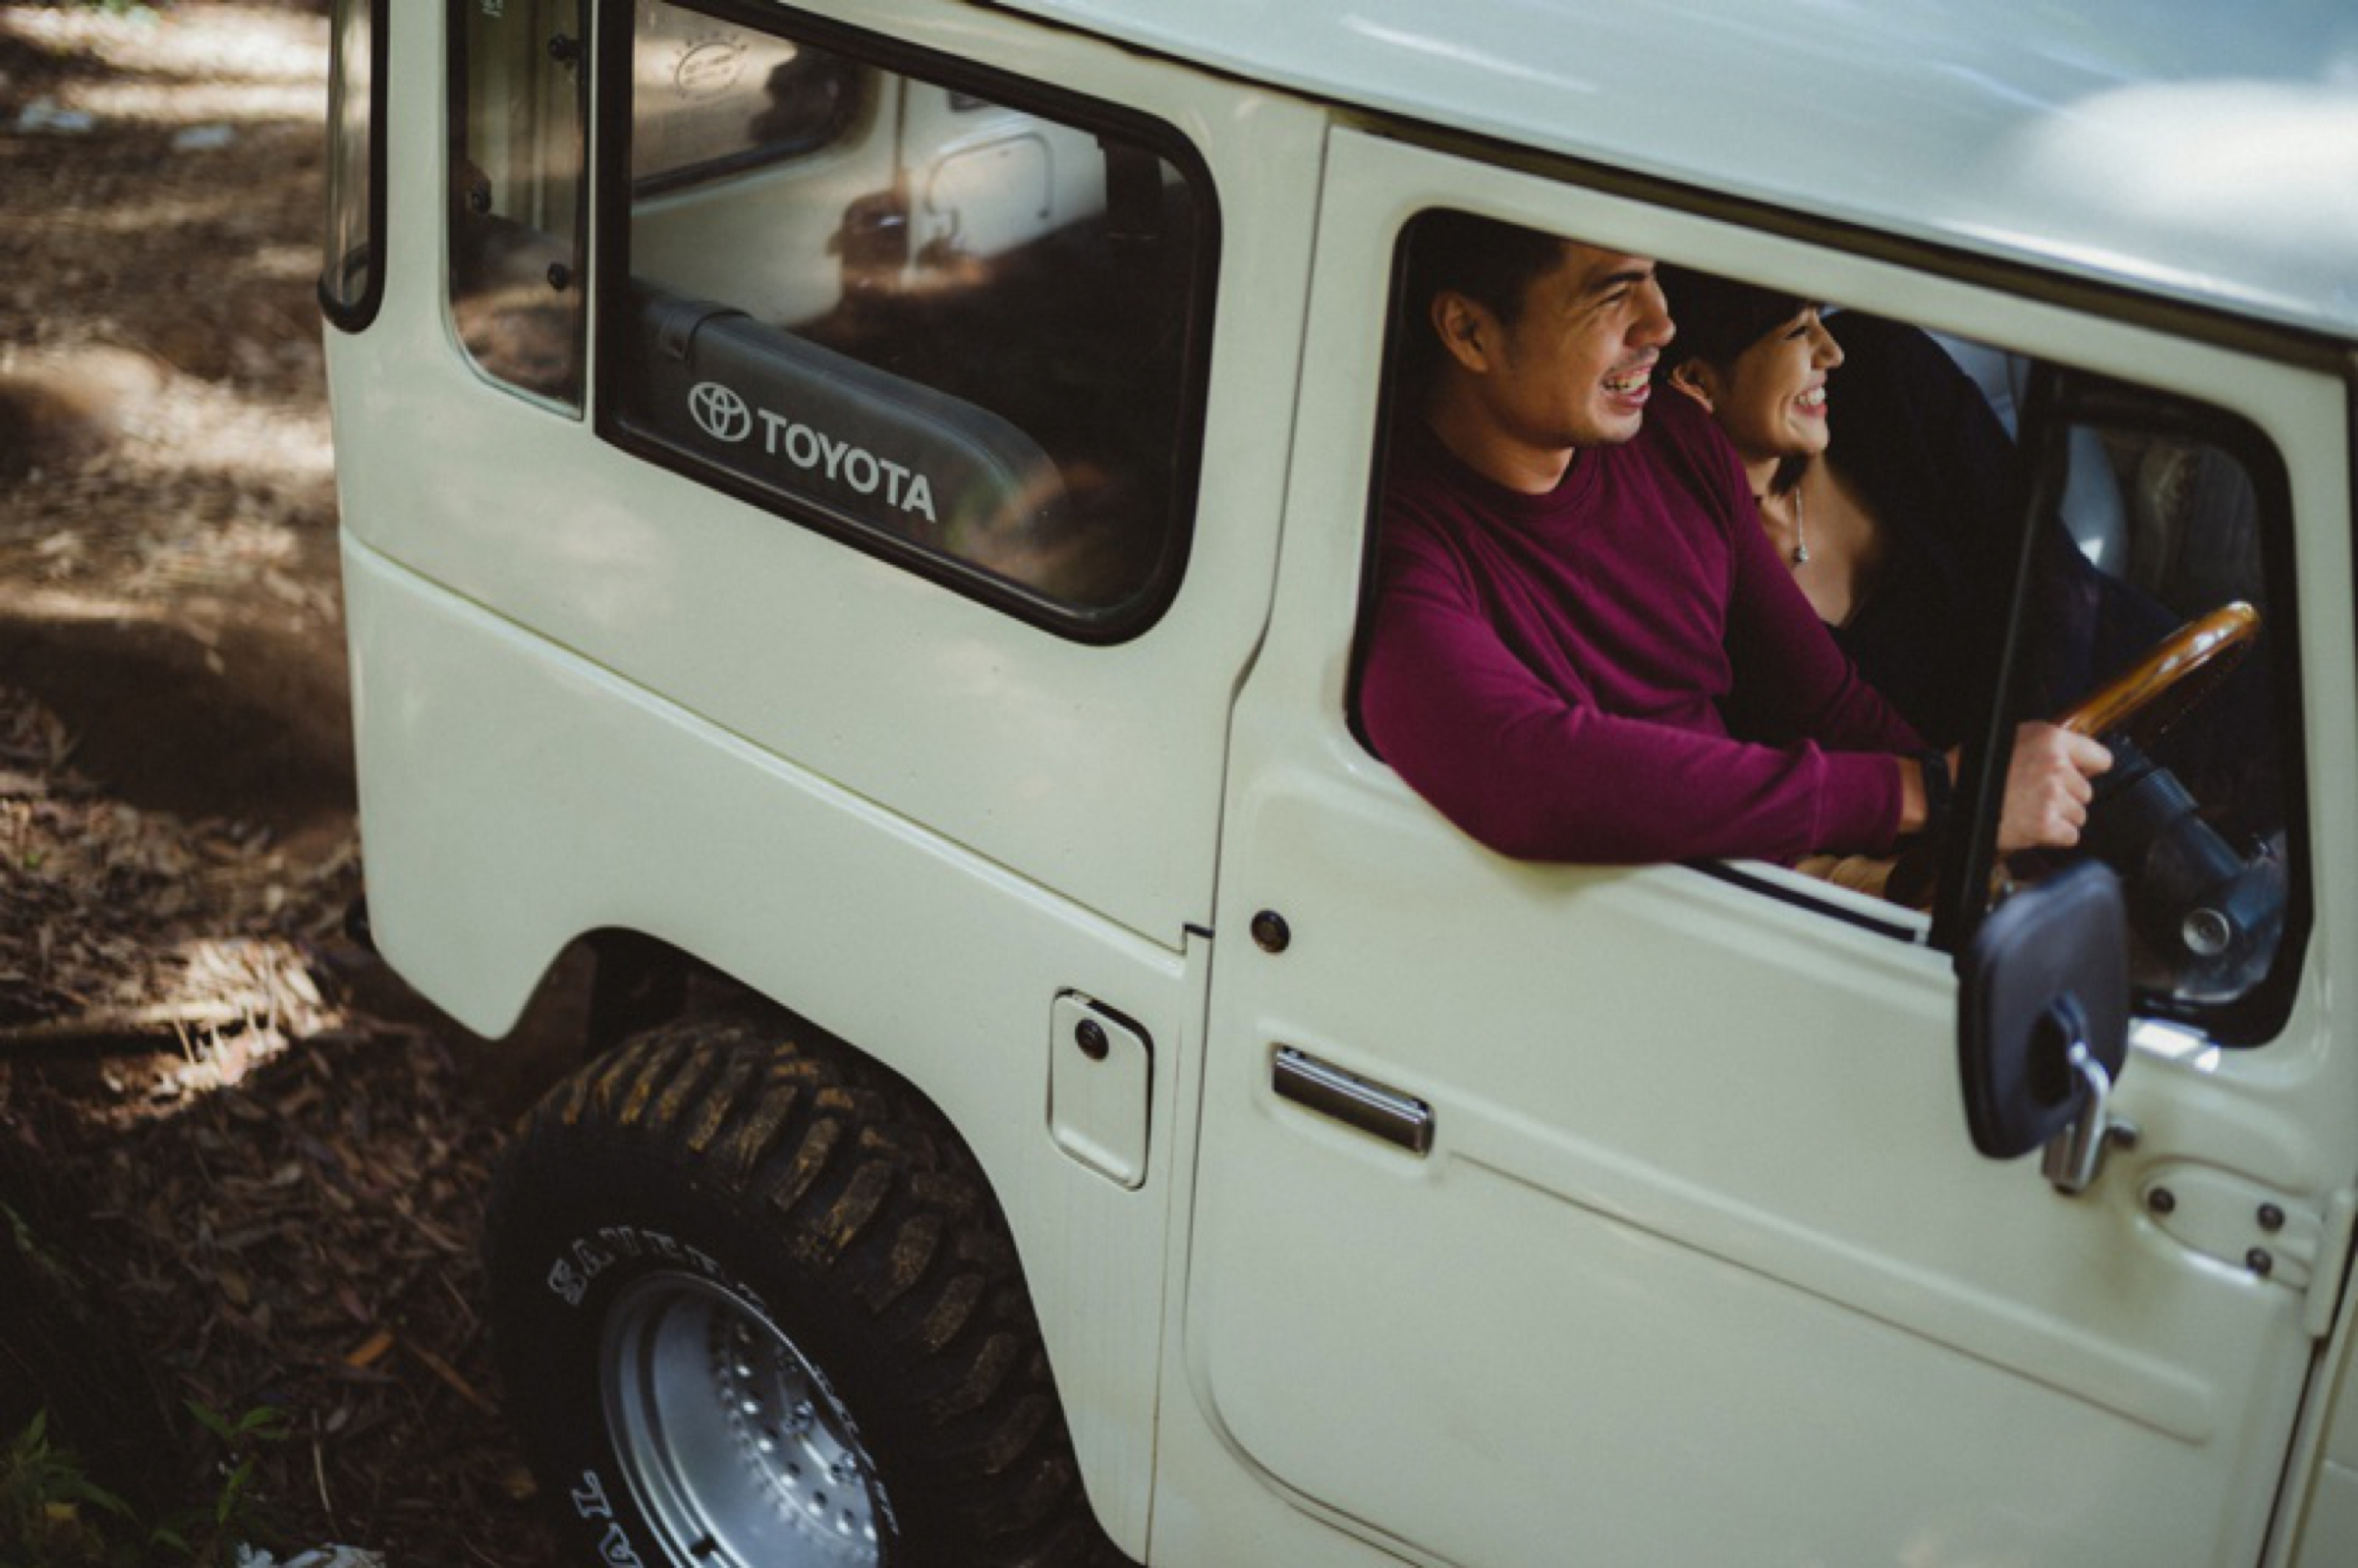 Surya-Chossy-Bali-Prewedding-Pyara-Photo-Evans 2.jpg